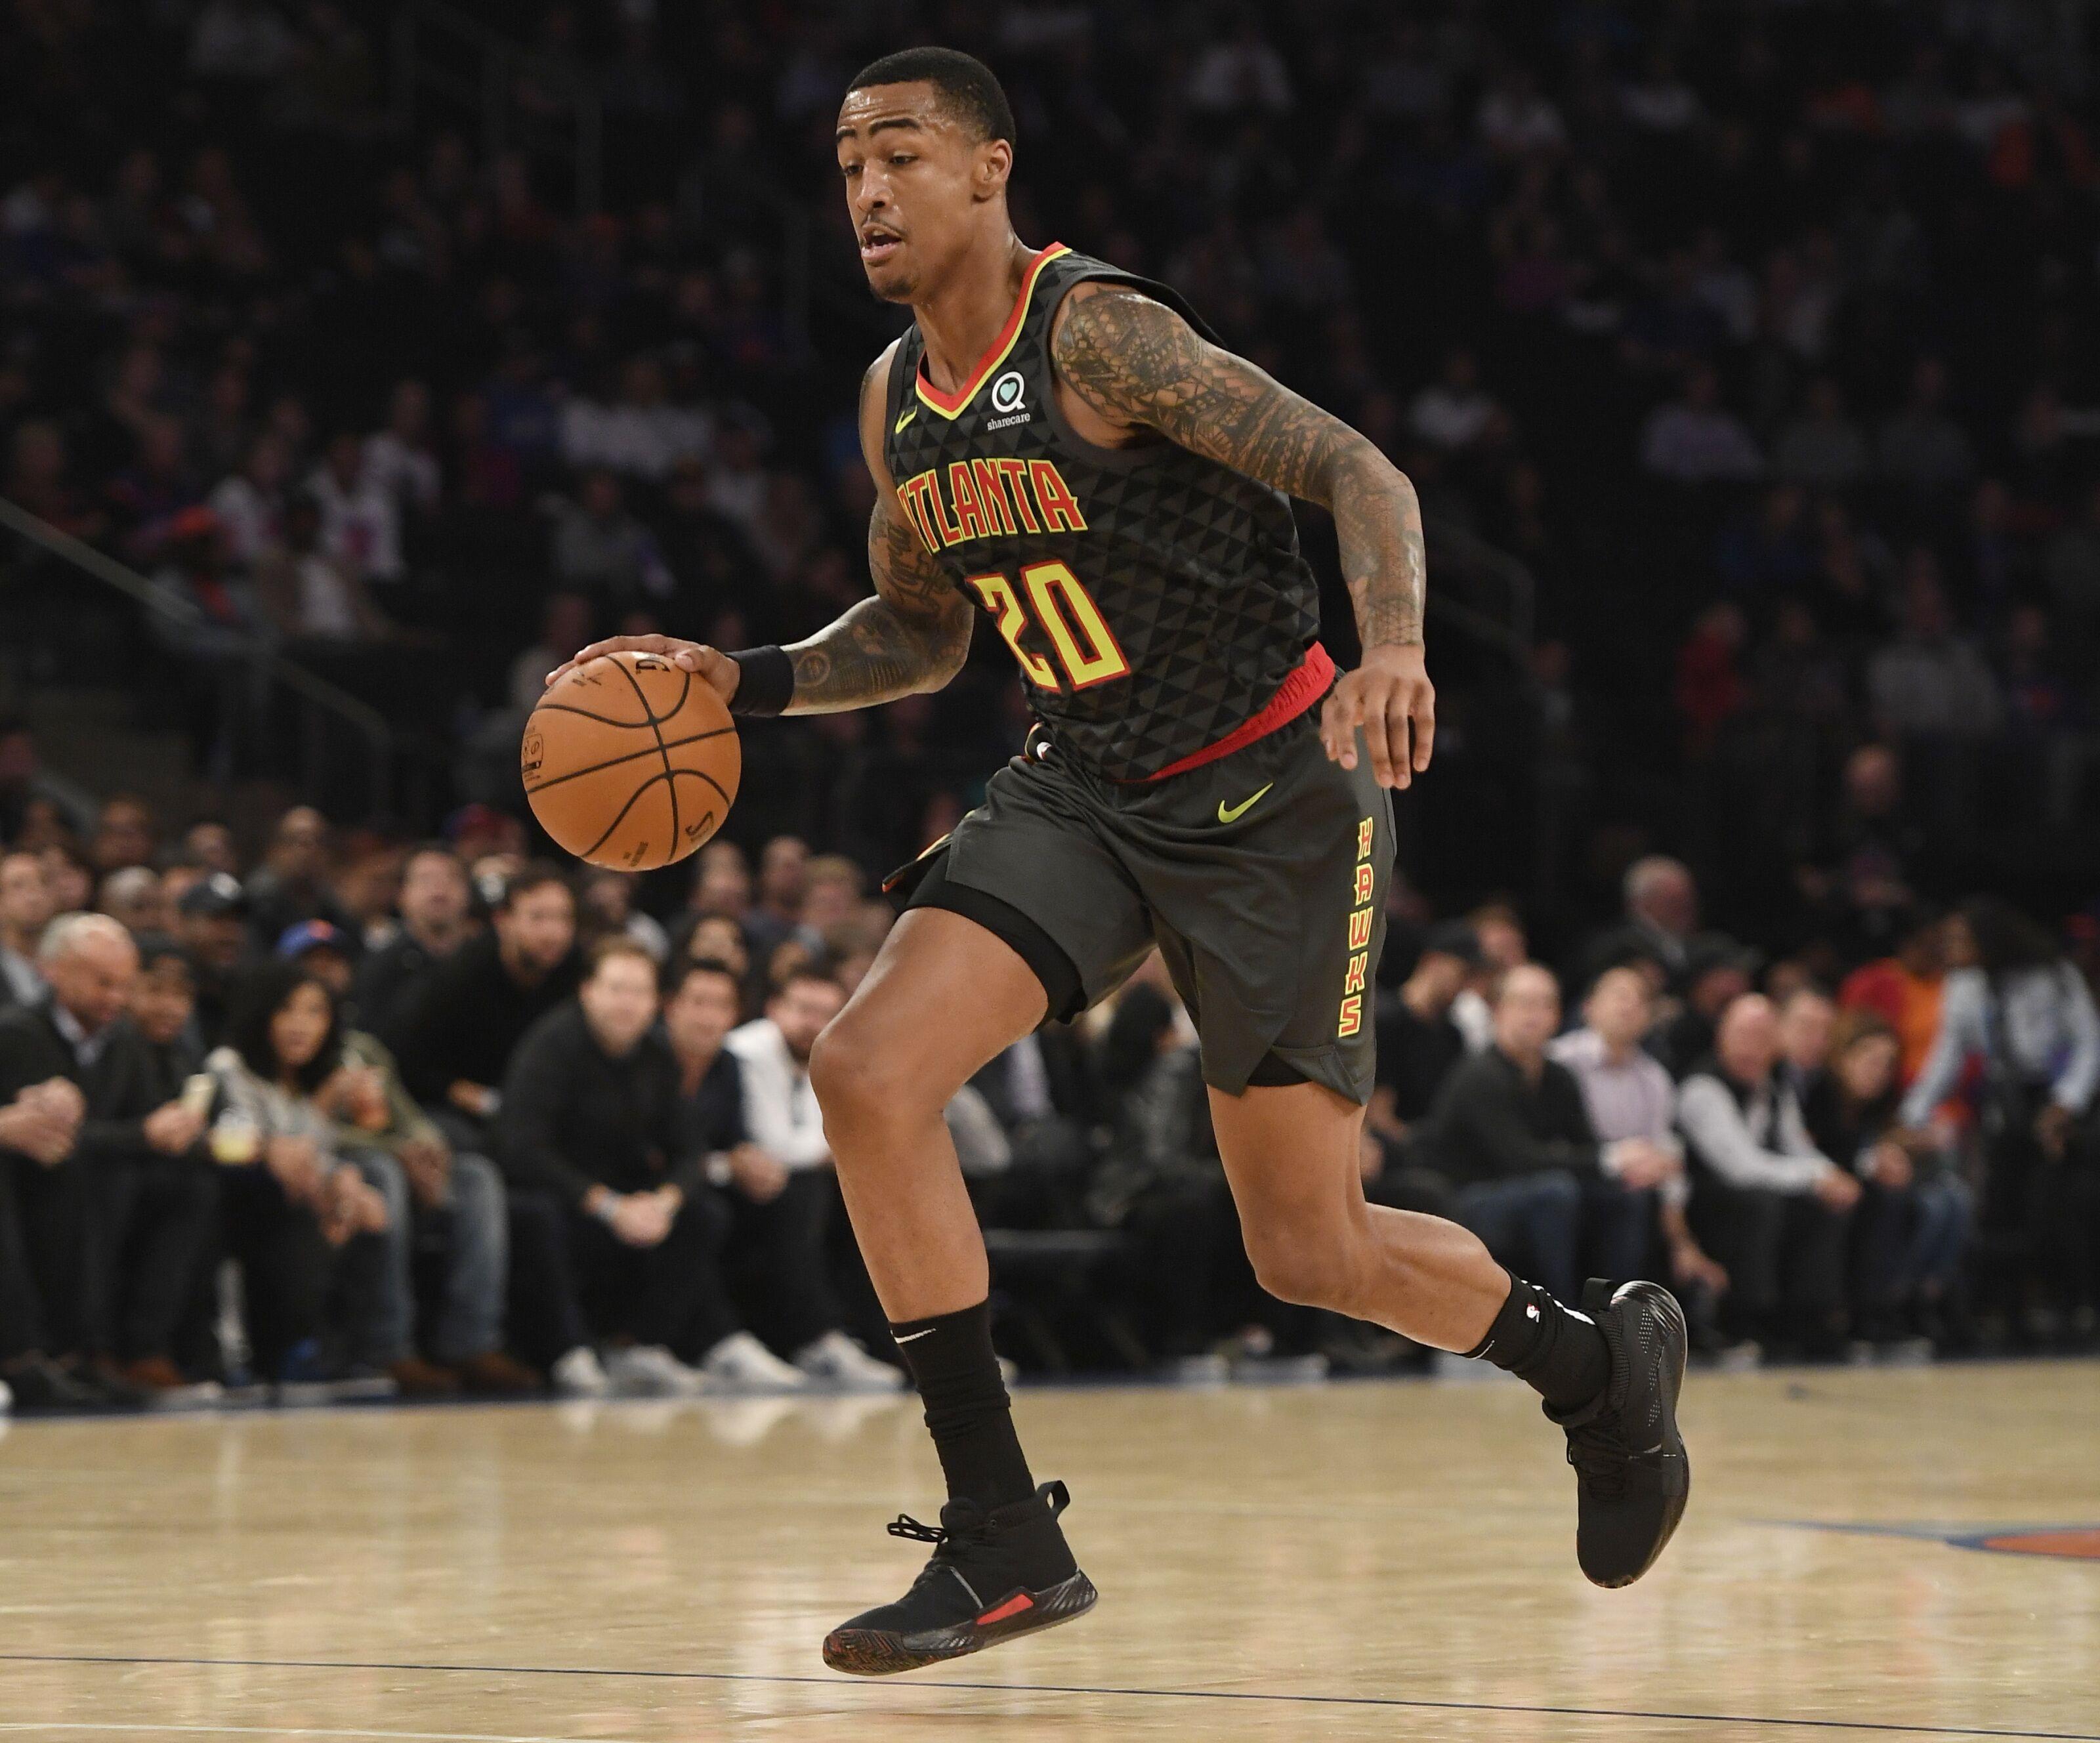 Recent rash of NBA suspensions for drug use raises concern